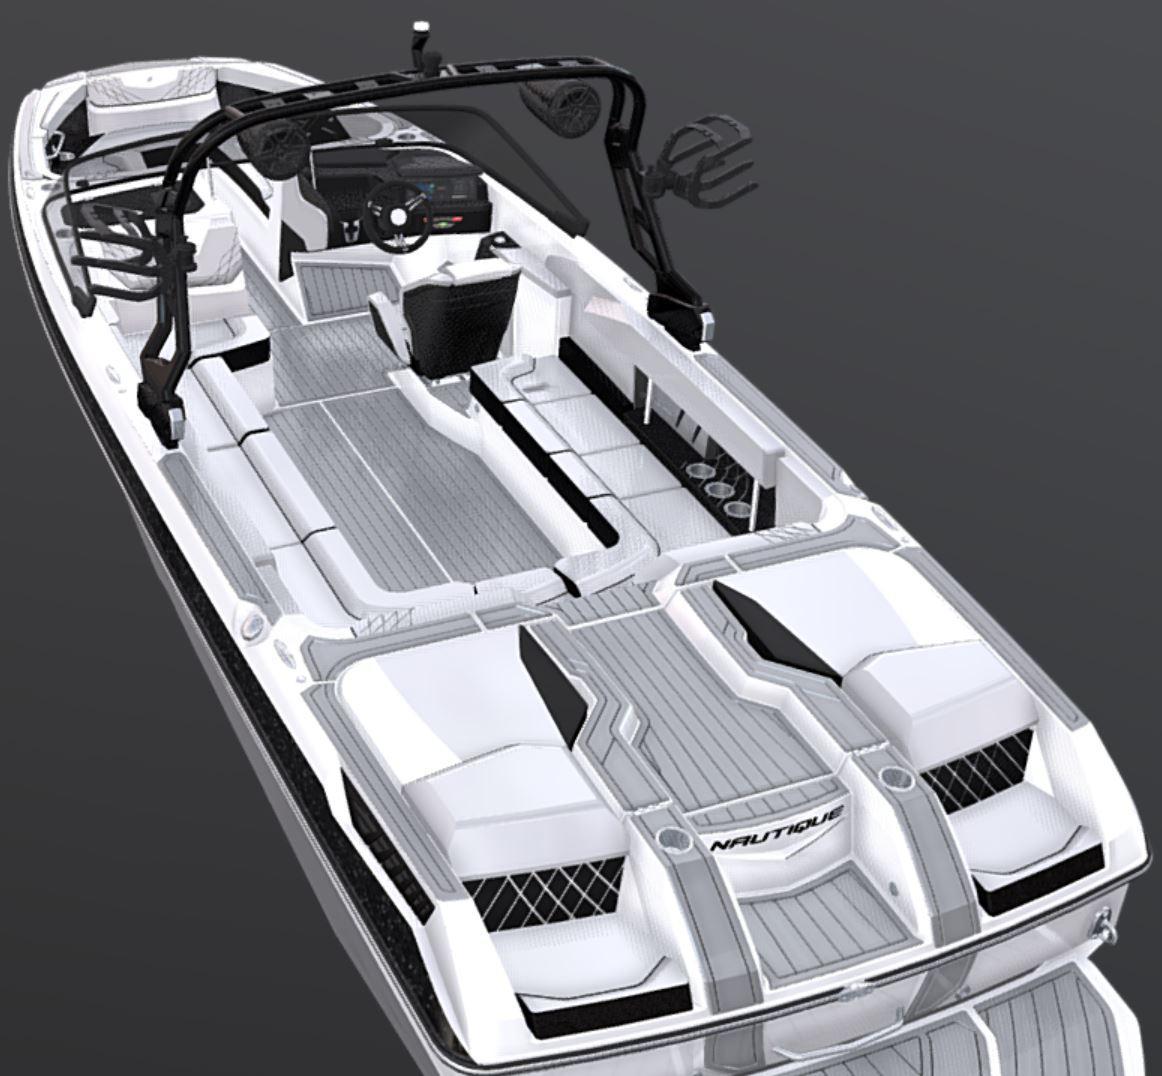 2021-Nautique-GS24-Jet-Black-Metal-Flake-Tungsten-Grey-Wake-Boat-3